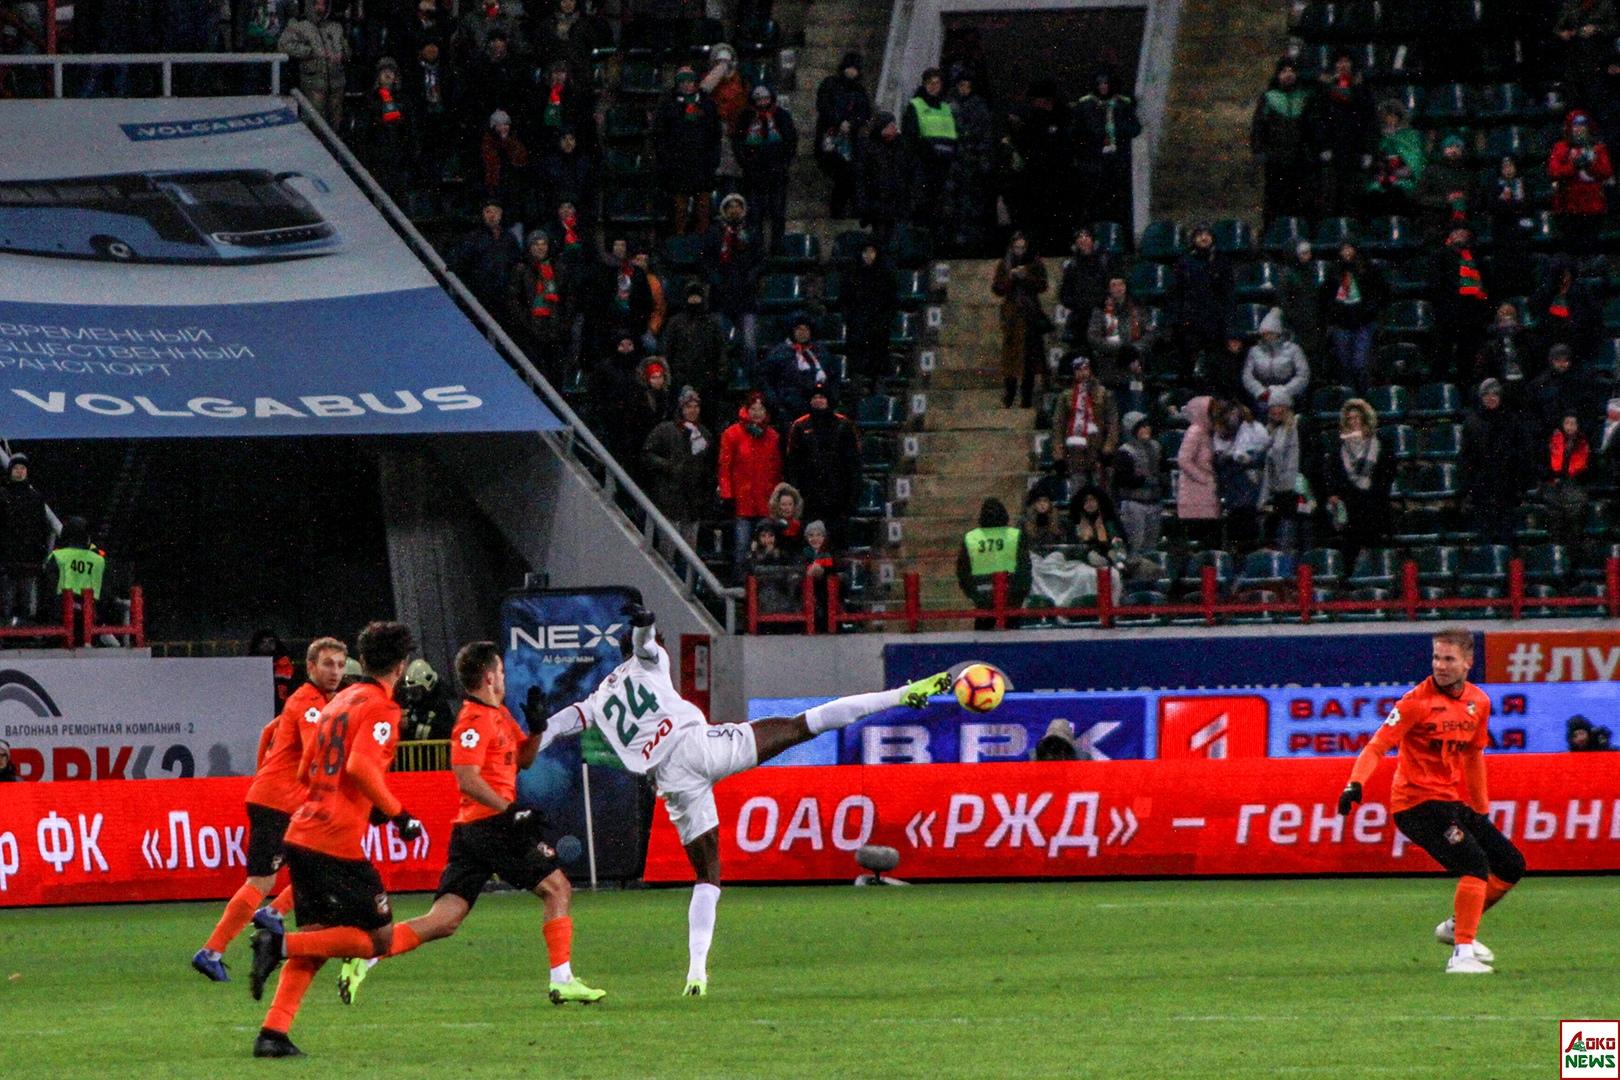 Лопес Эдер. Фото: Дмитрий Бурдонов / Loko.News